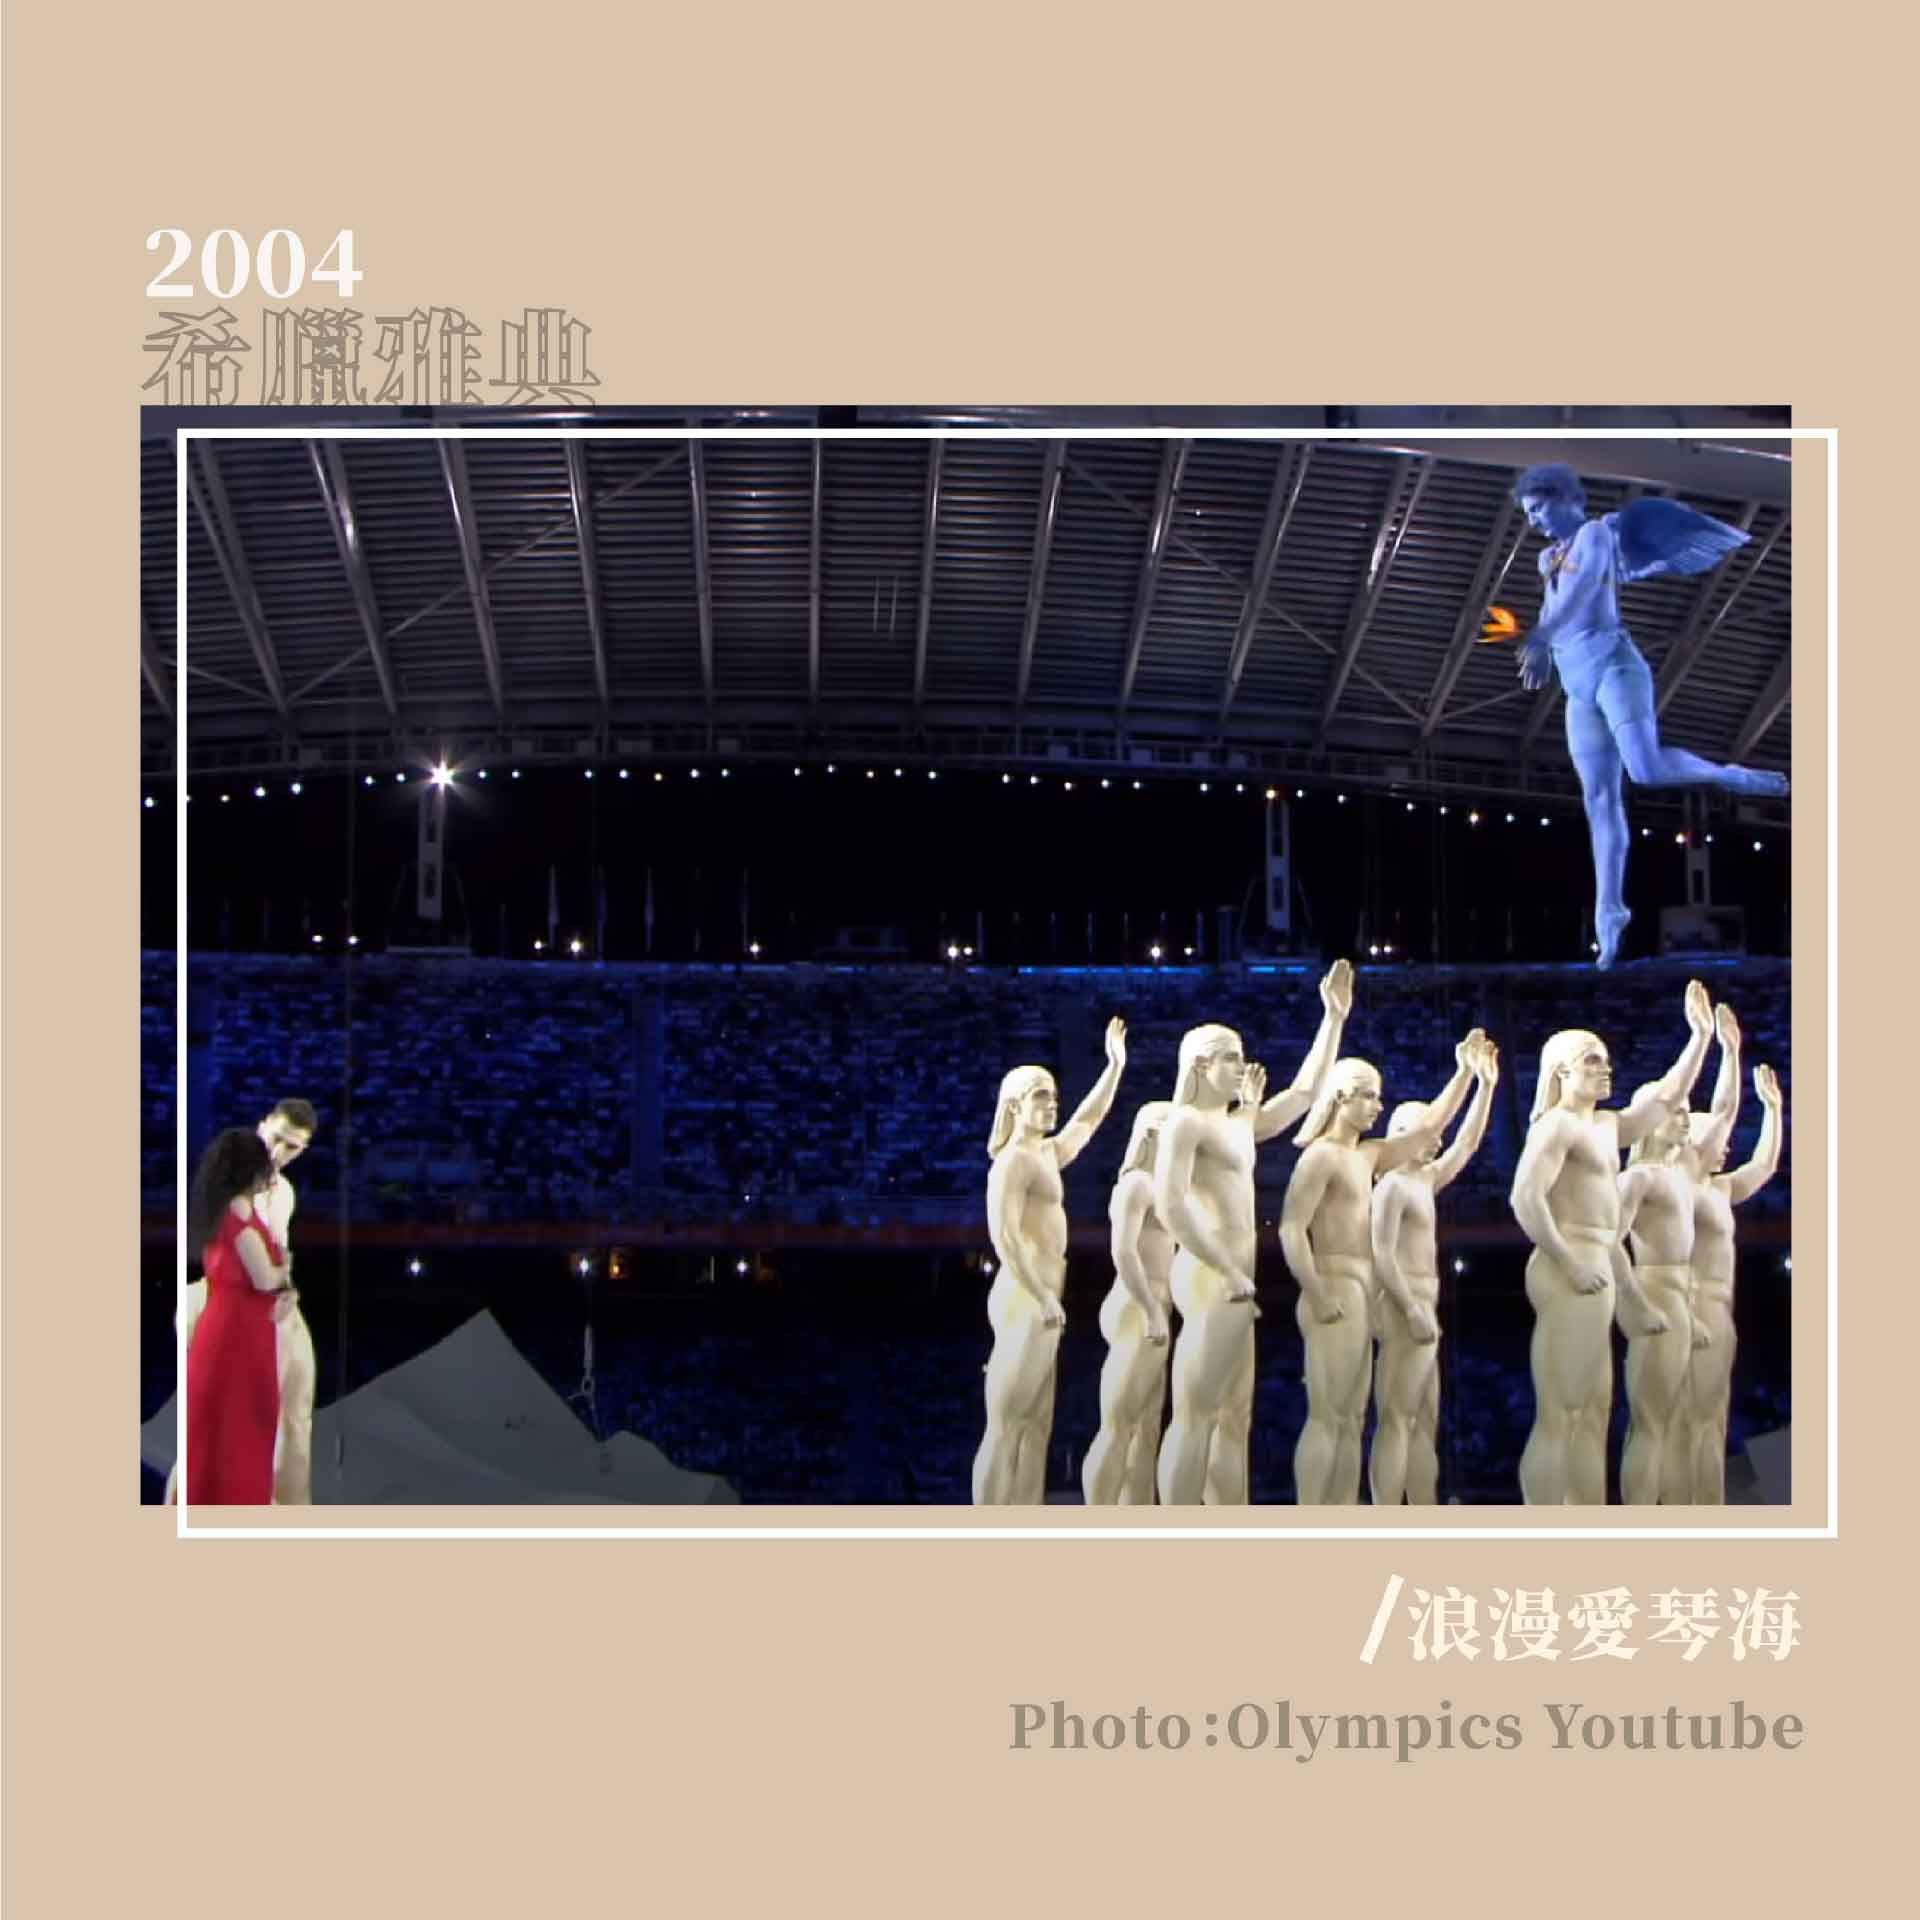 AroundTheOlympics